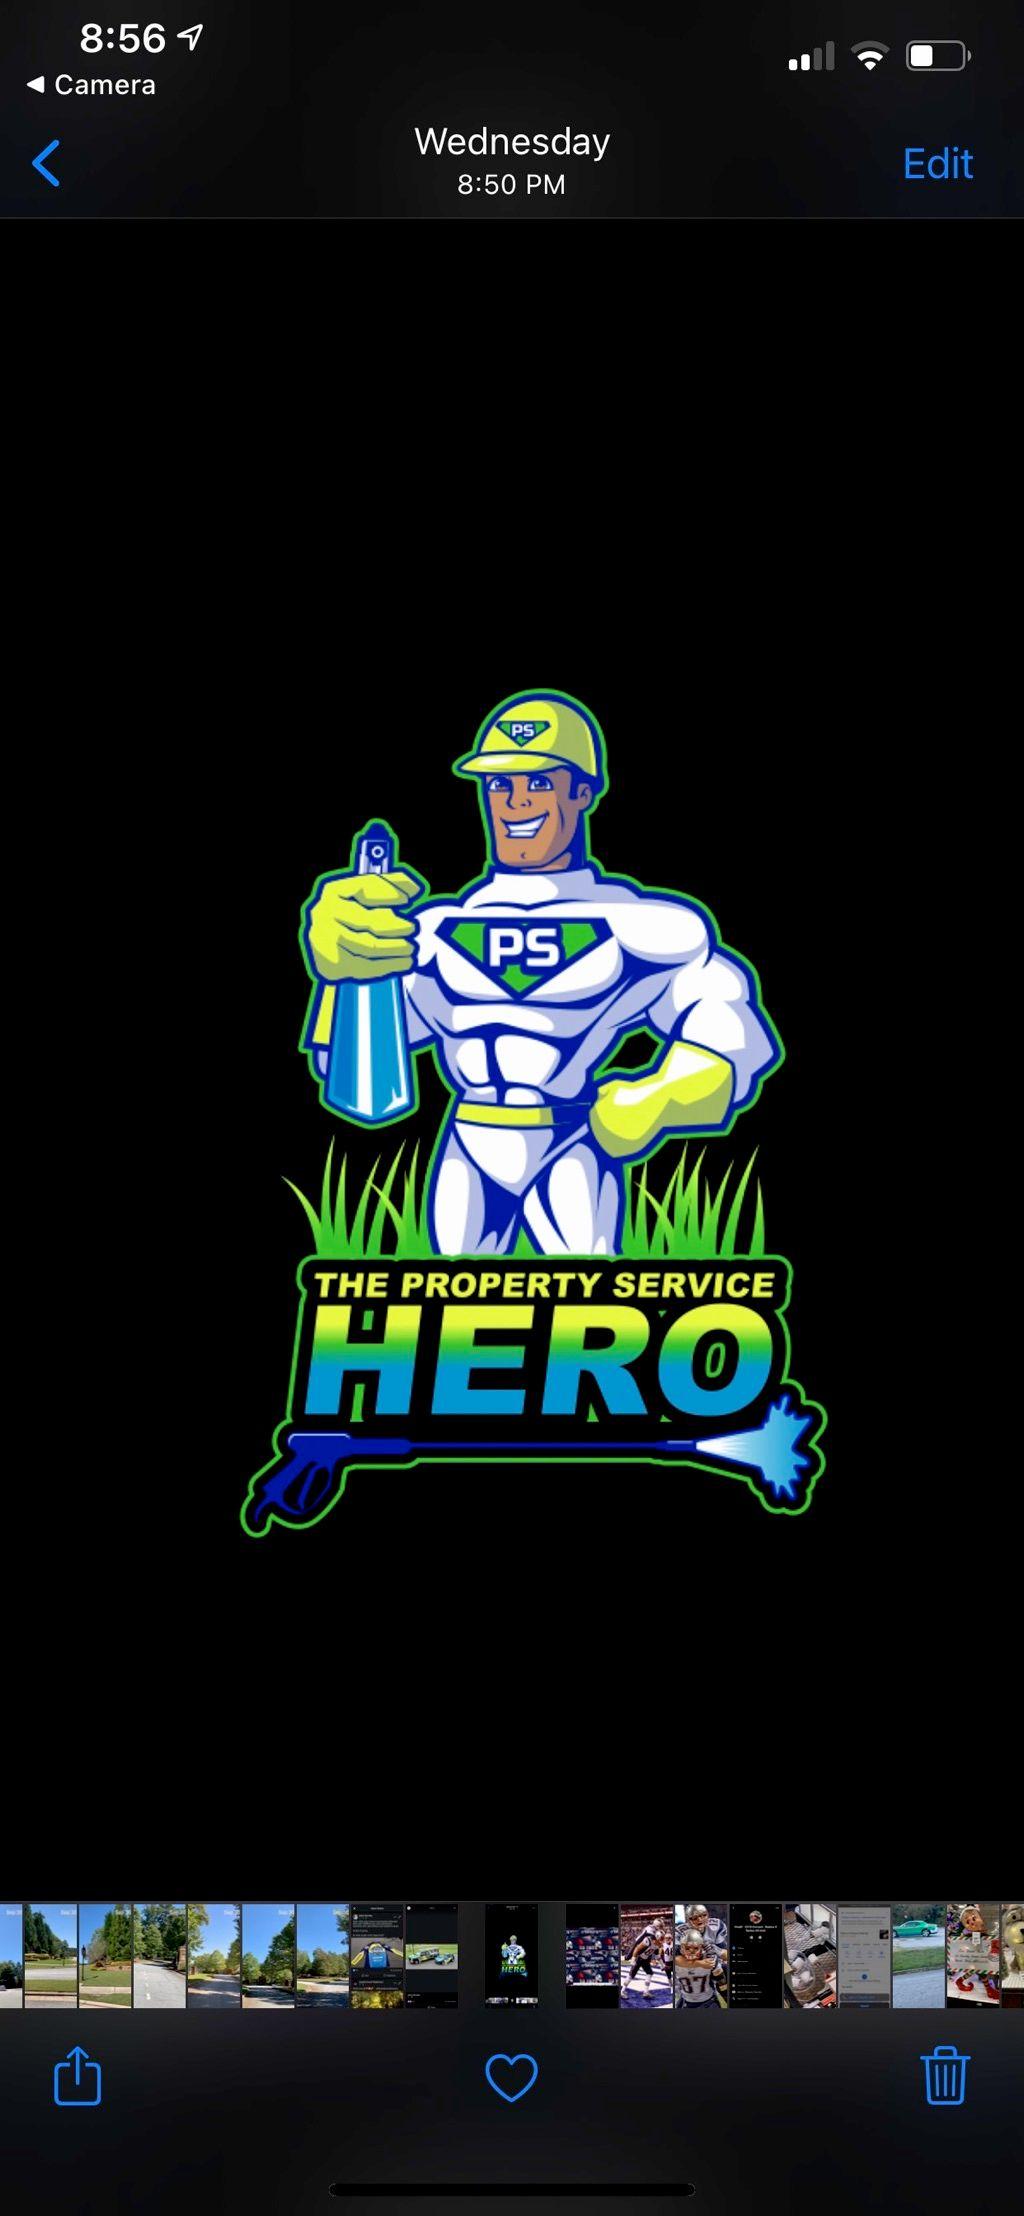 The Property Service Hero LLC